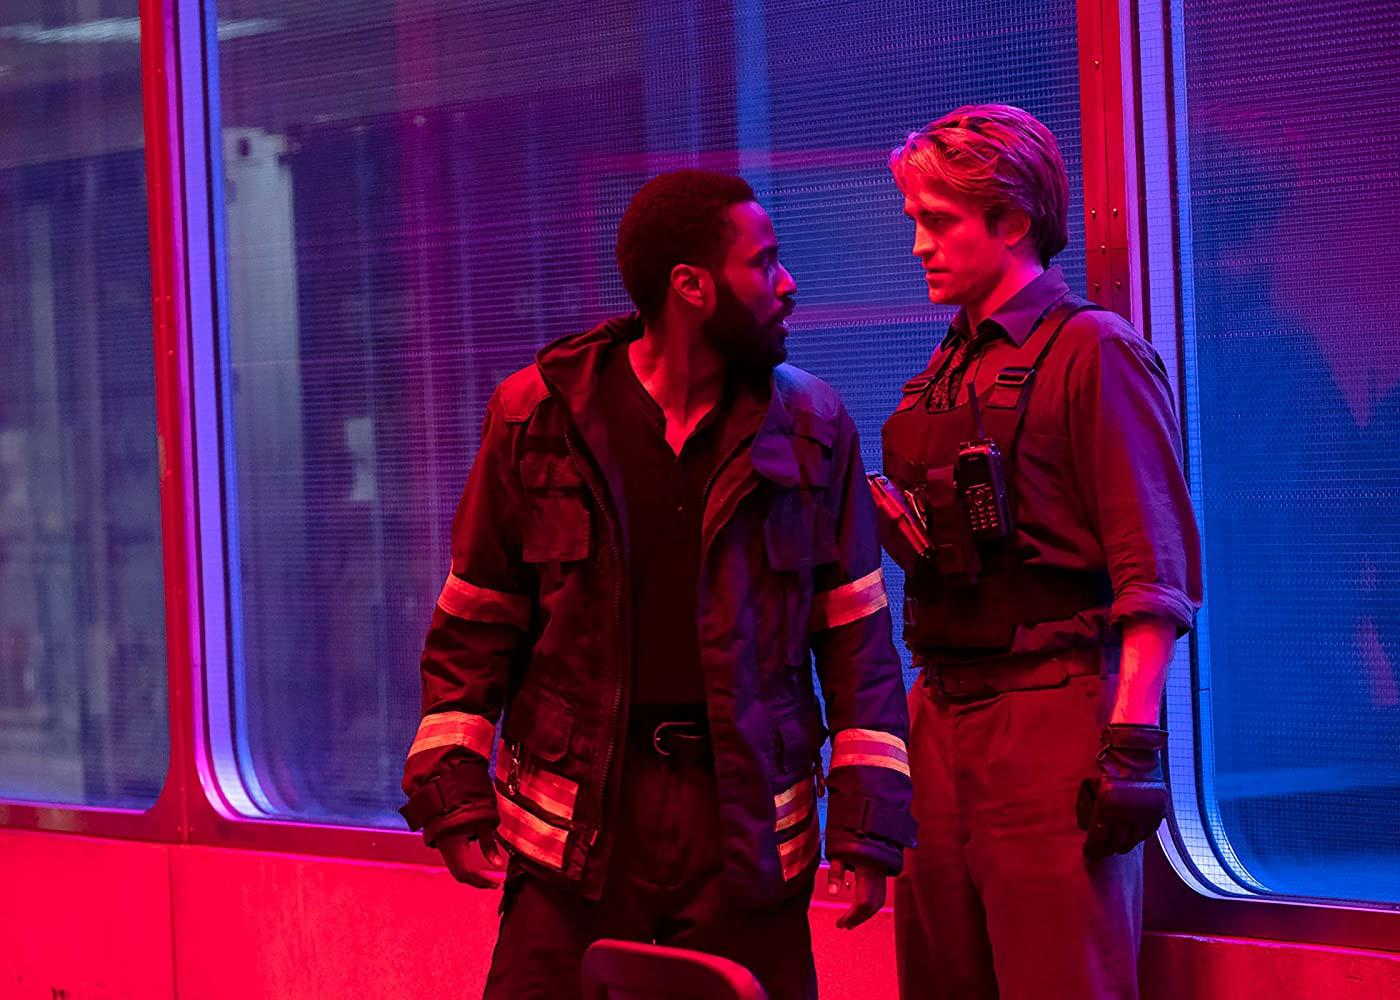 John David Washington og Robert Pattinson i Tenet (SF Studios Norge/Warner Bros.)